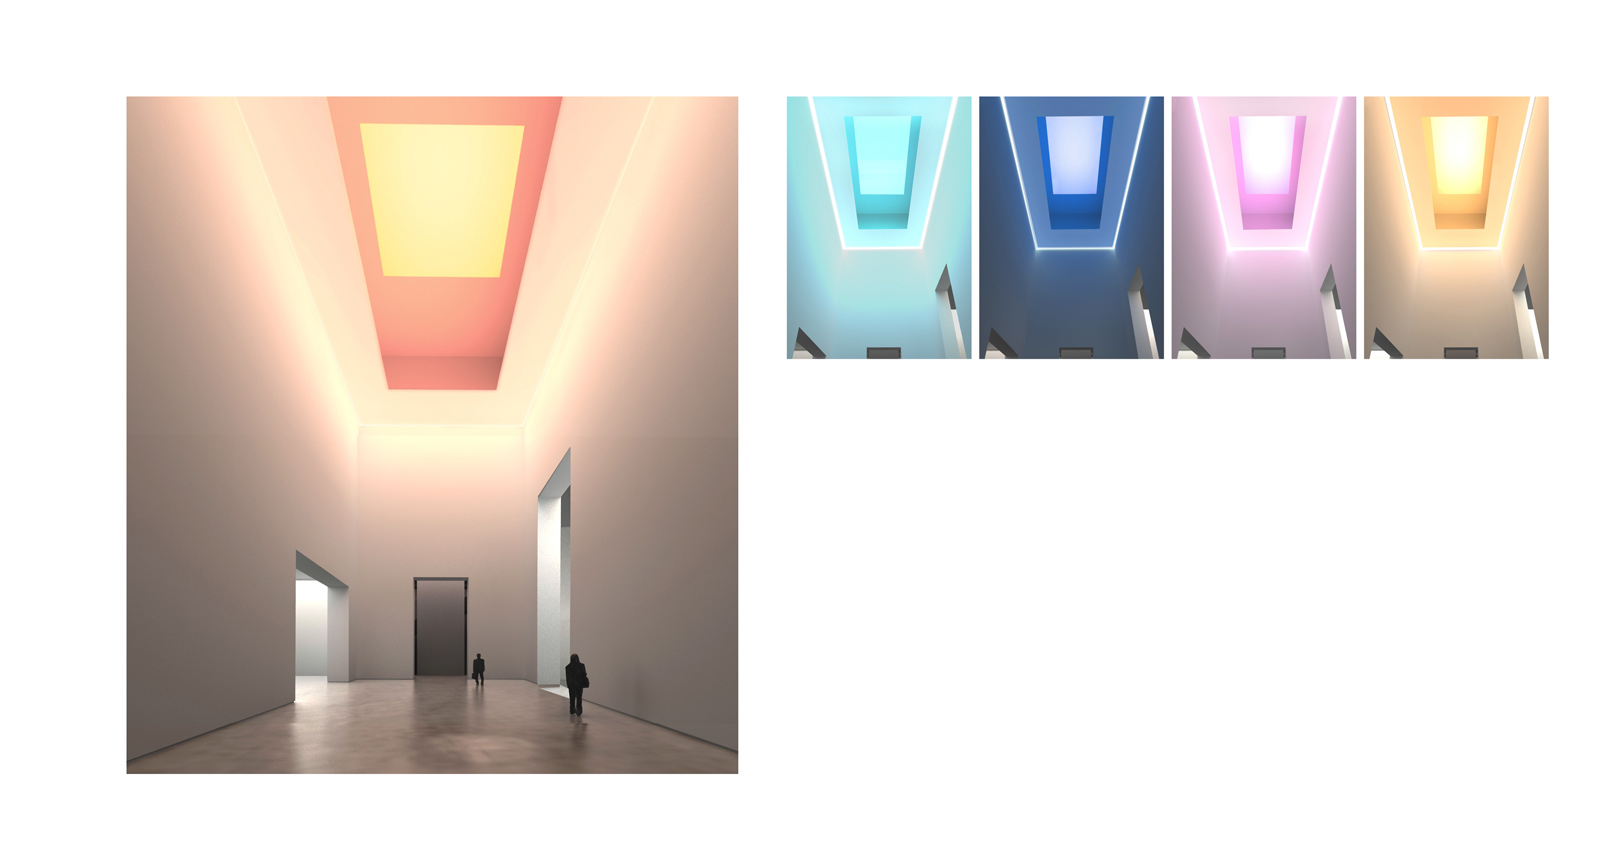 waa Museum of Contemporary Art WestBund renovation street view 未觉建筑 西岸当代美术馆 改造